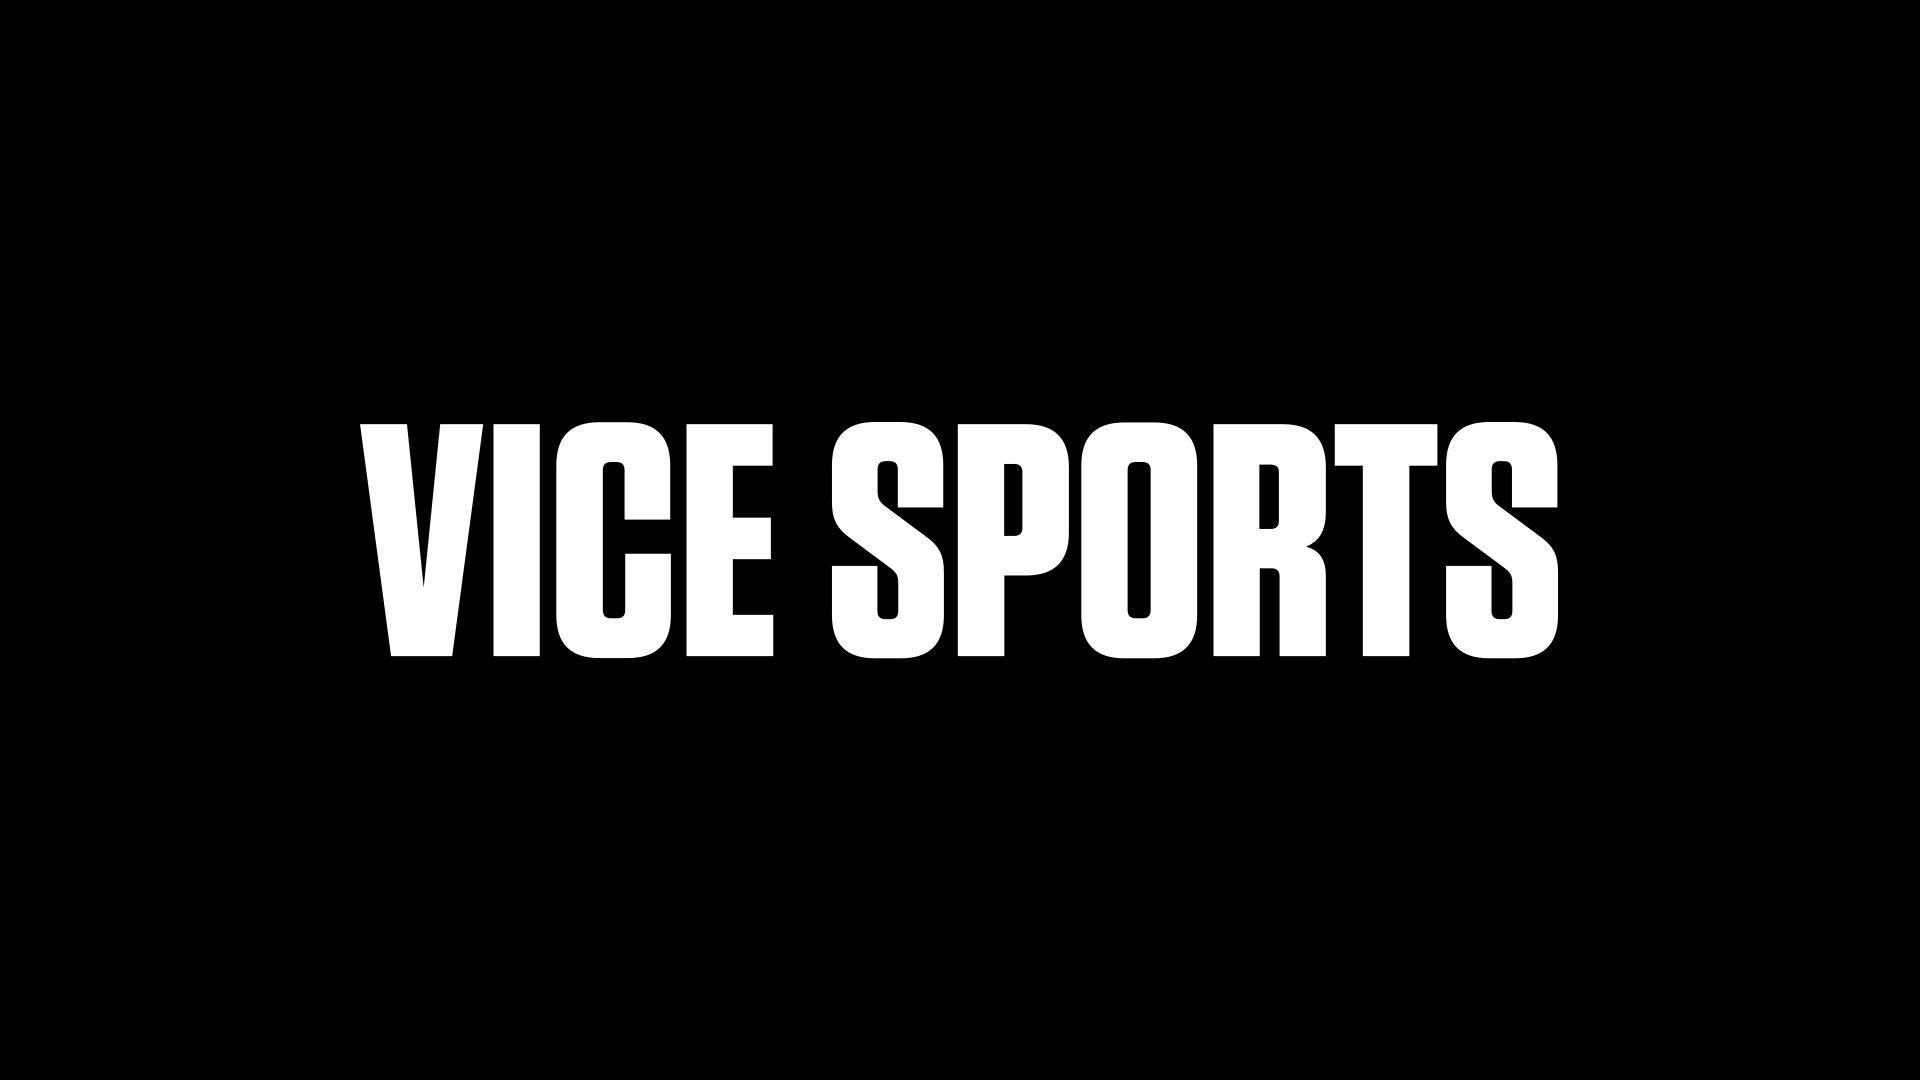 118cf1af6 Dwyane Wade - VICE Sports